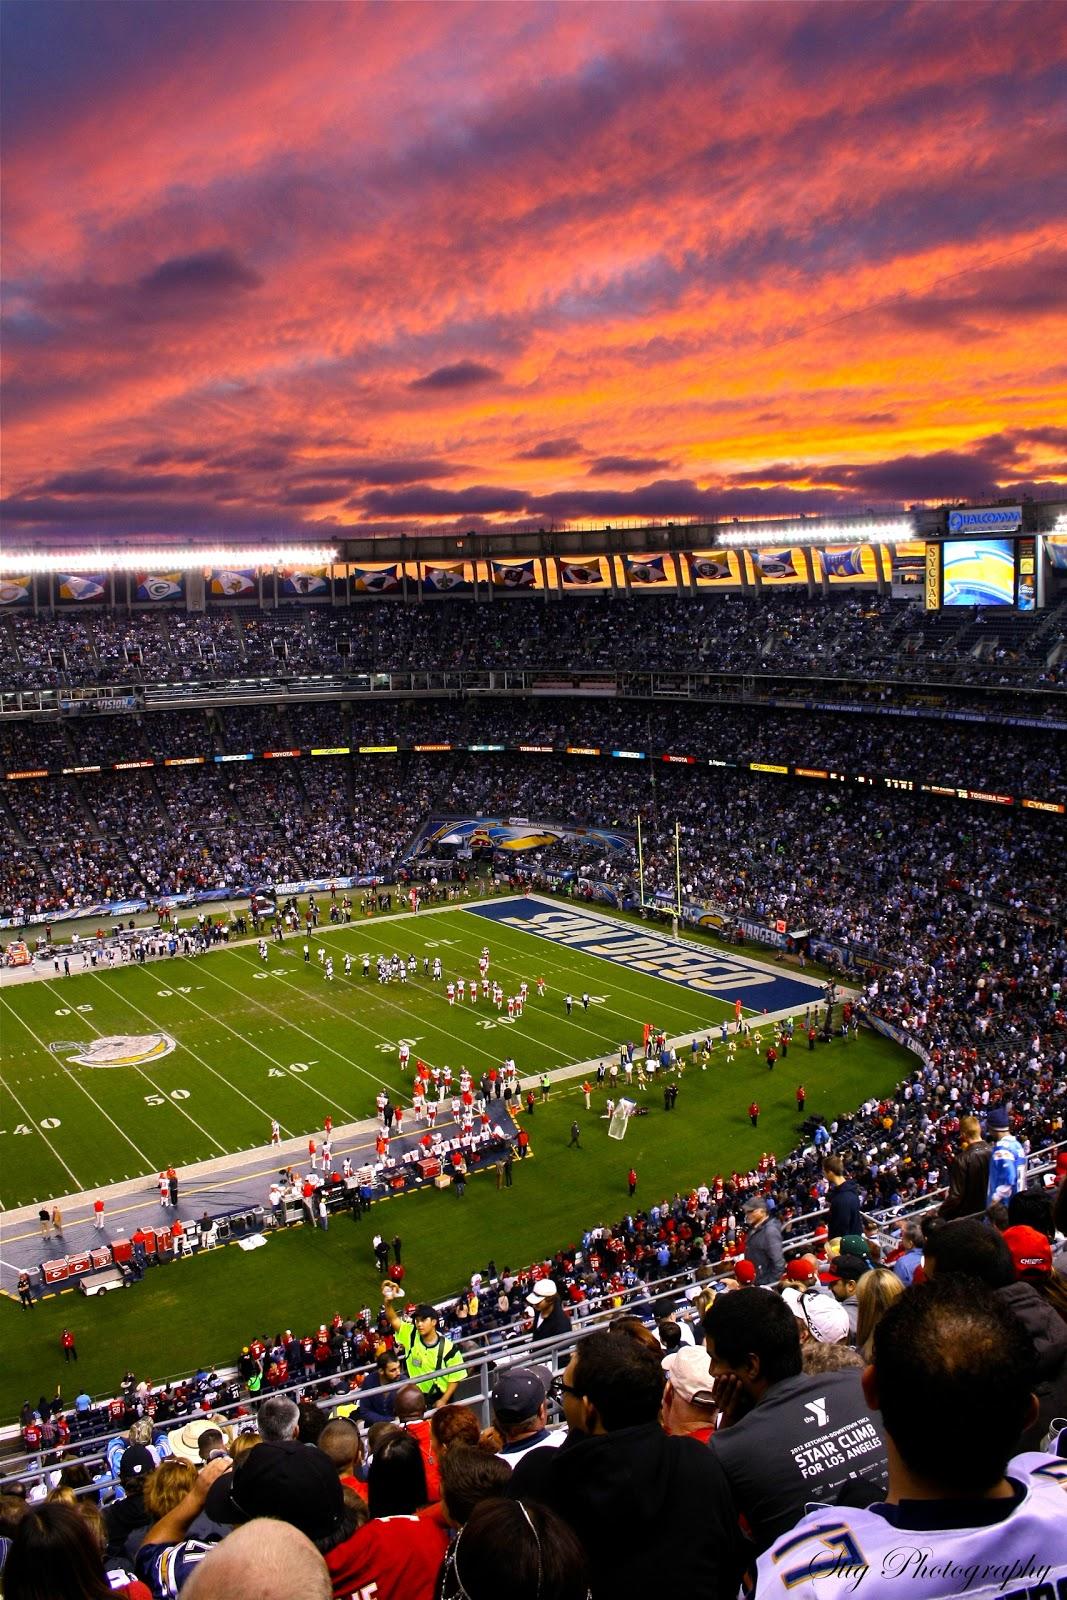 PhotograStig: Session at Qualcomm Stadium with Chargers ... Qualcomm Stadium Chargers